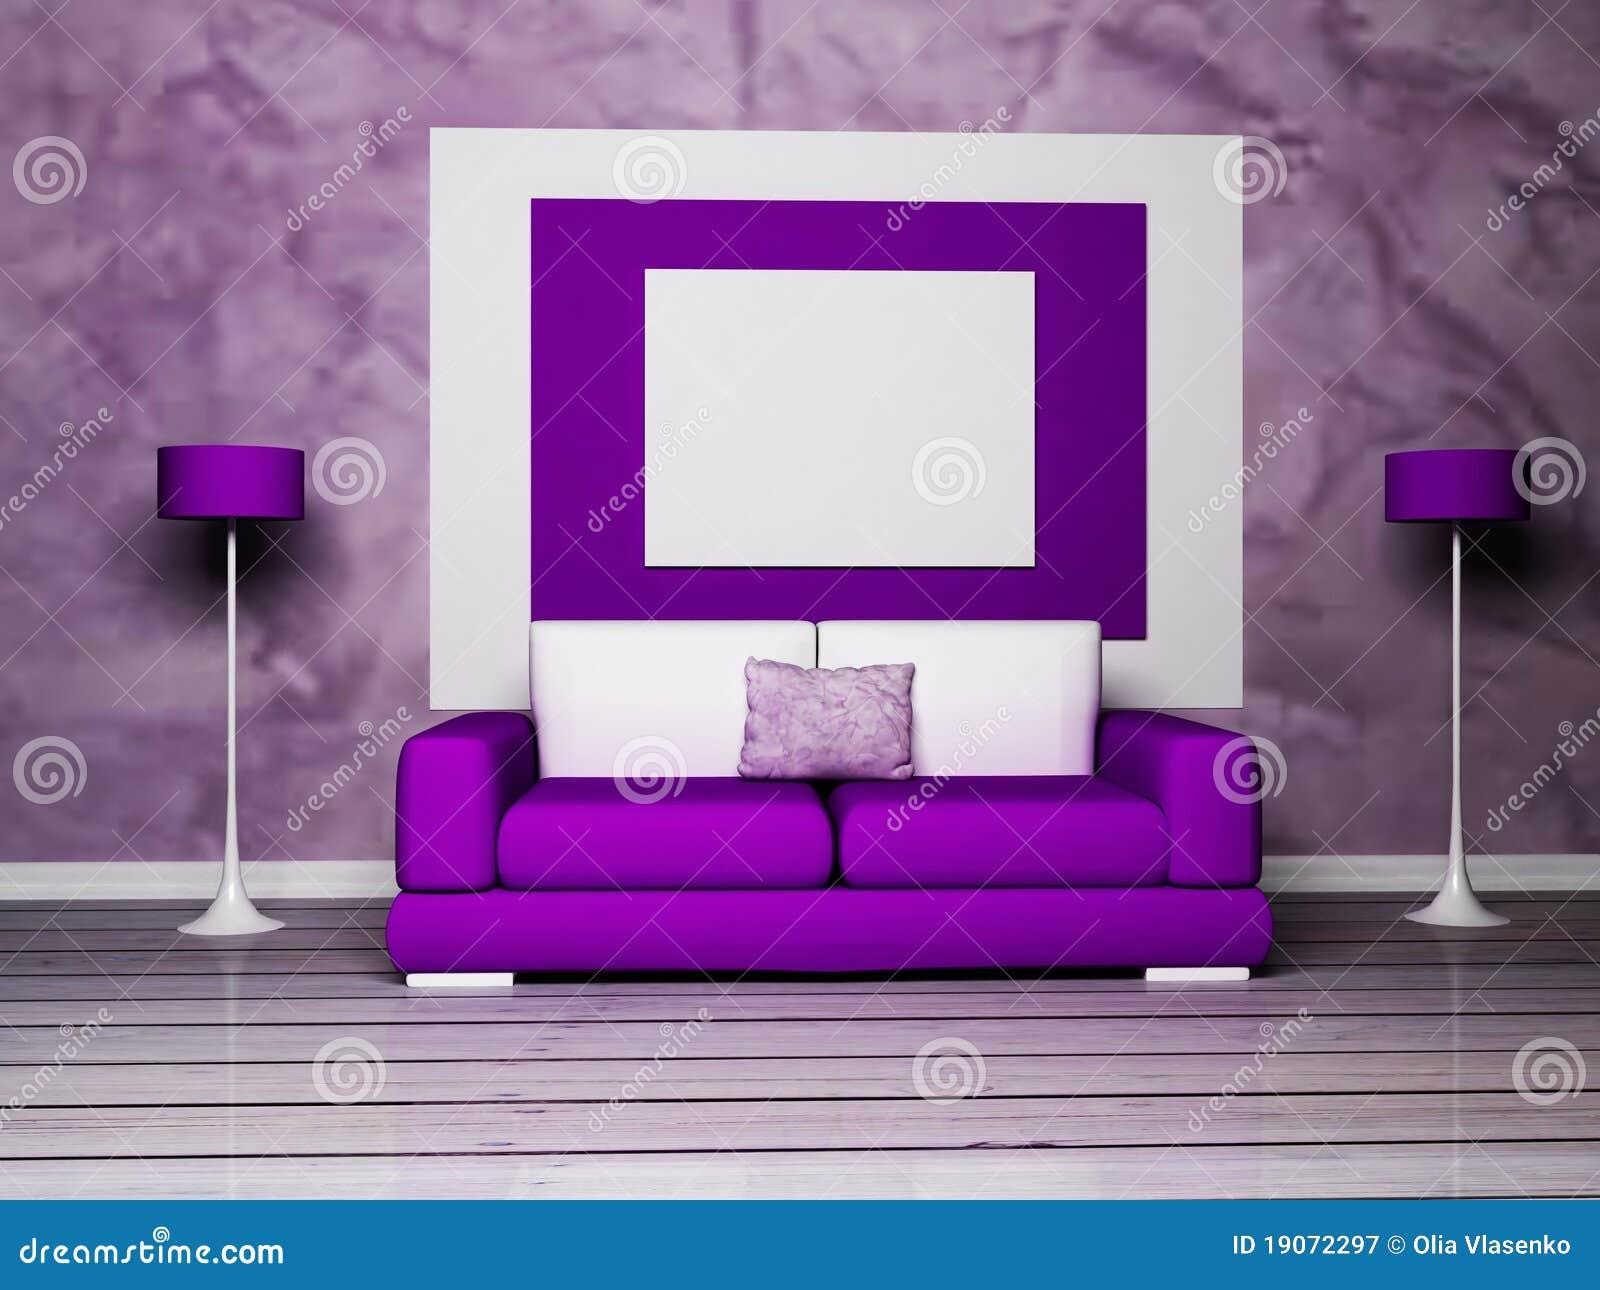 Interior Design Purple Living Room Interior Design Of Modern Black Living Room Royalty Free Stock